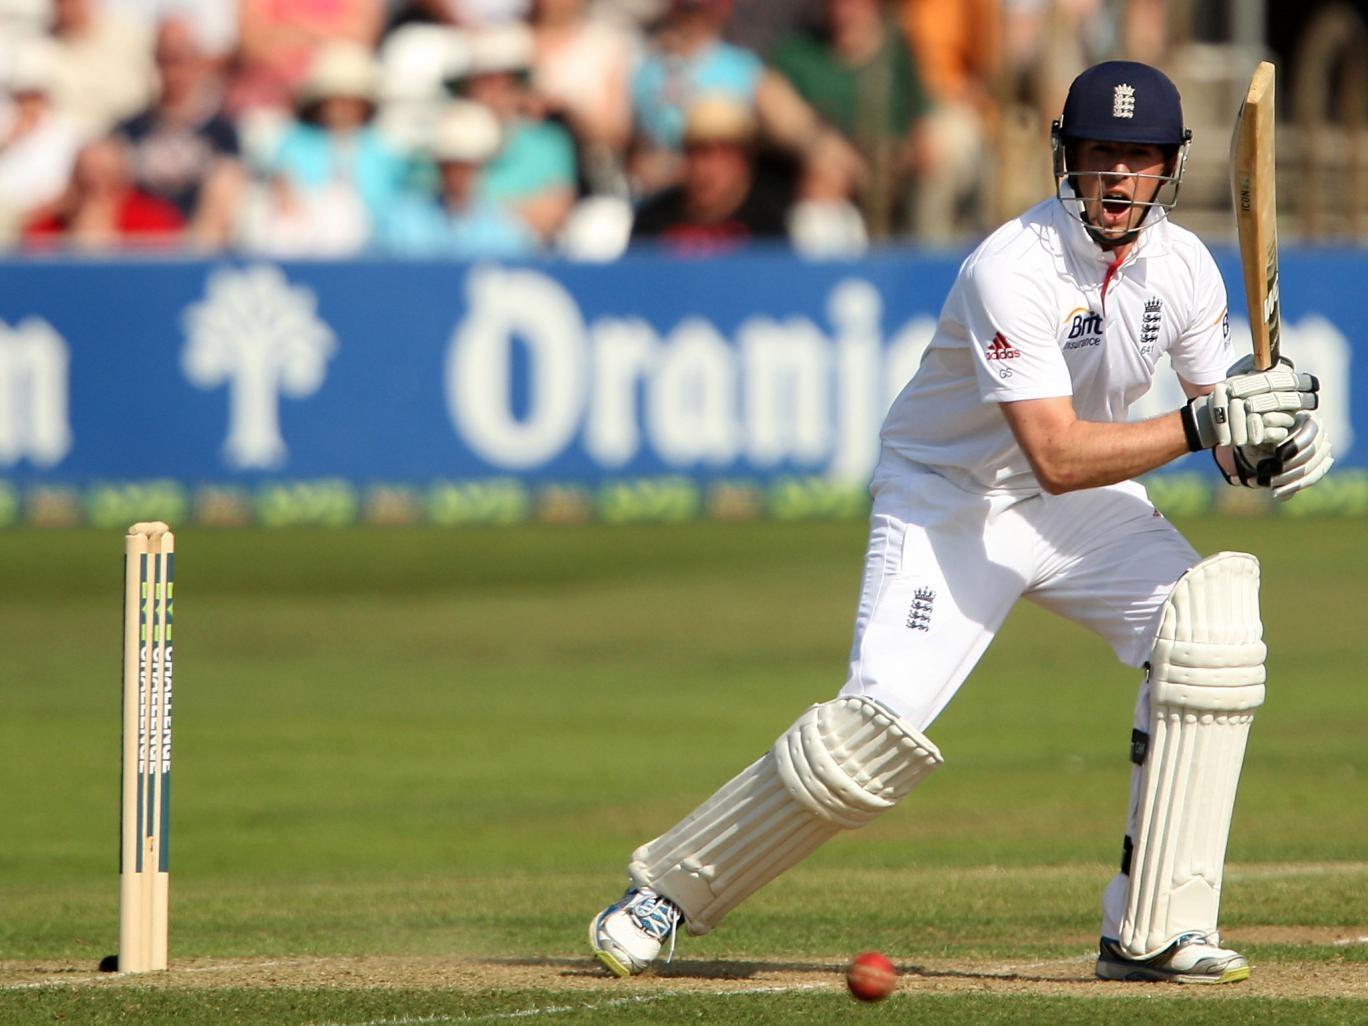 England's Graeme Swann on his way to an unbeaten 62